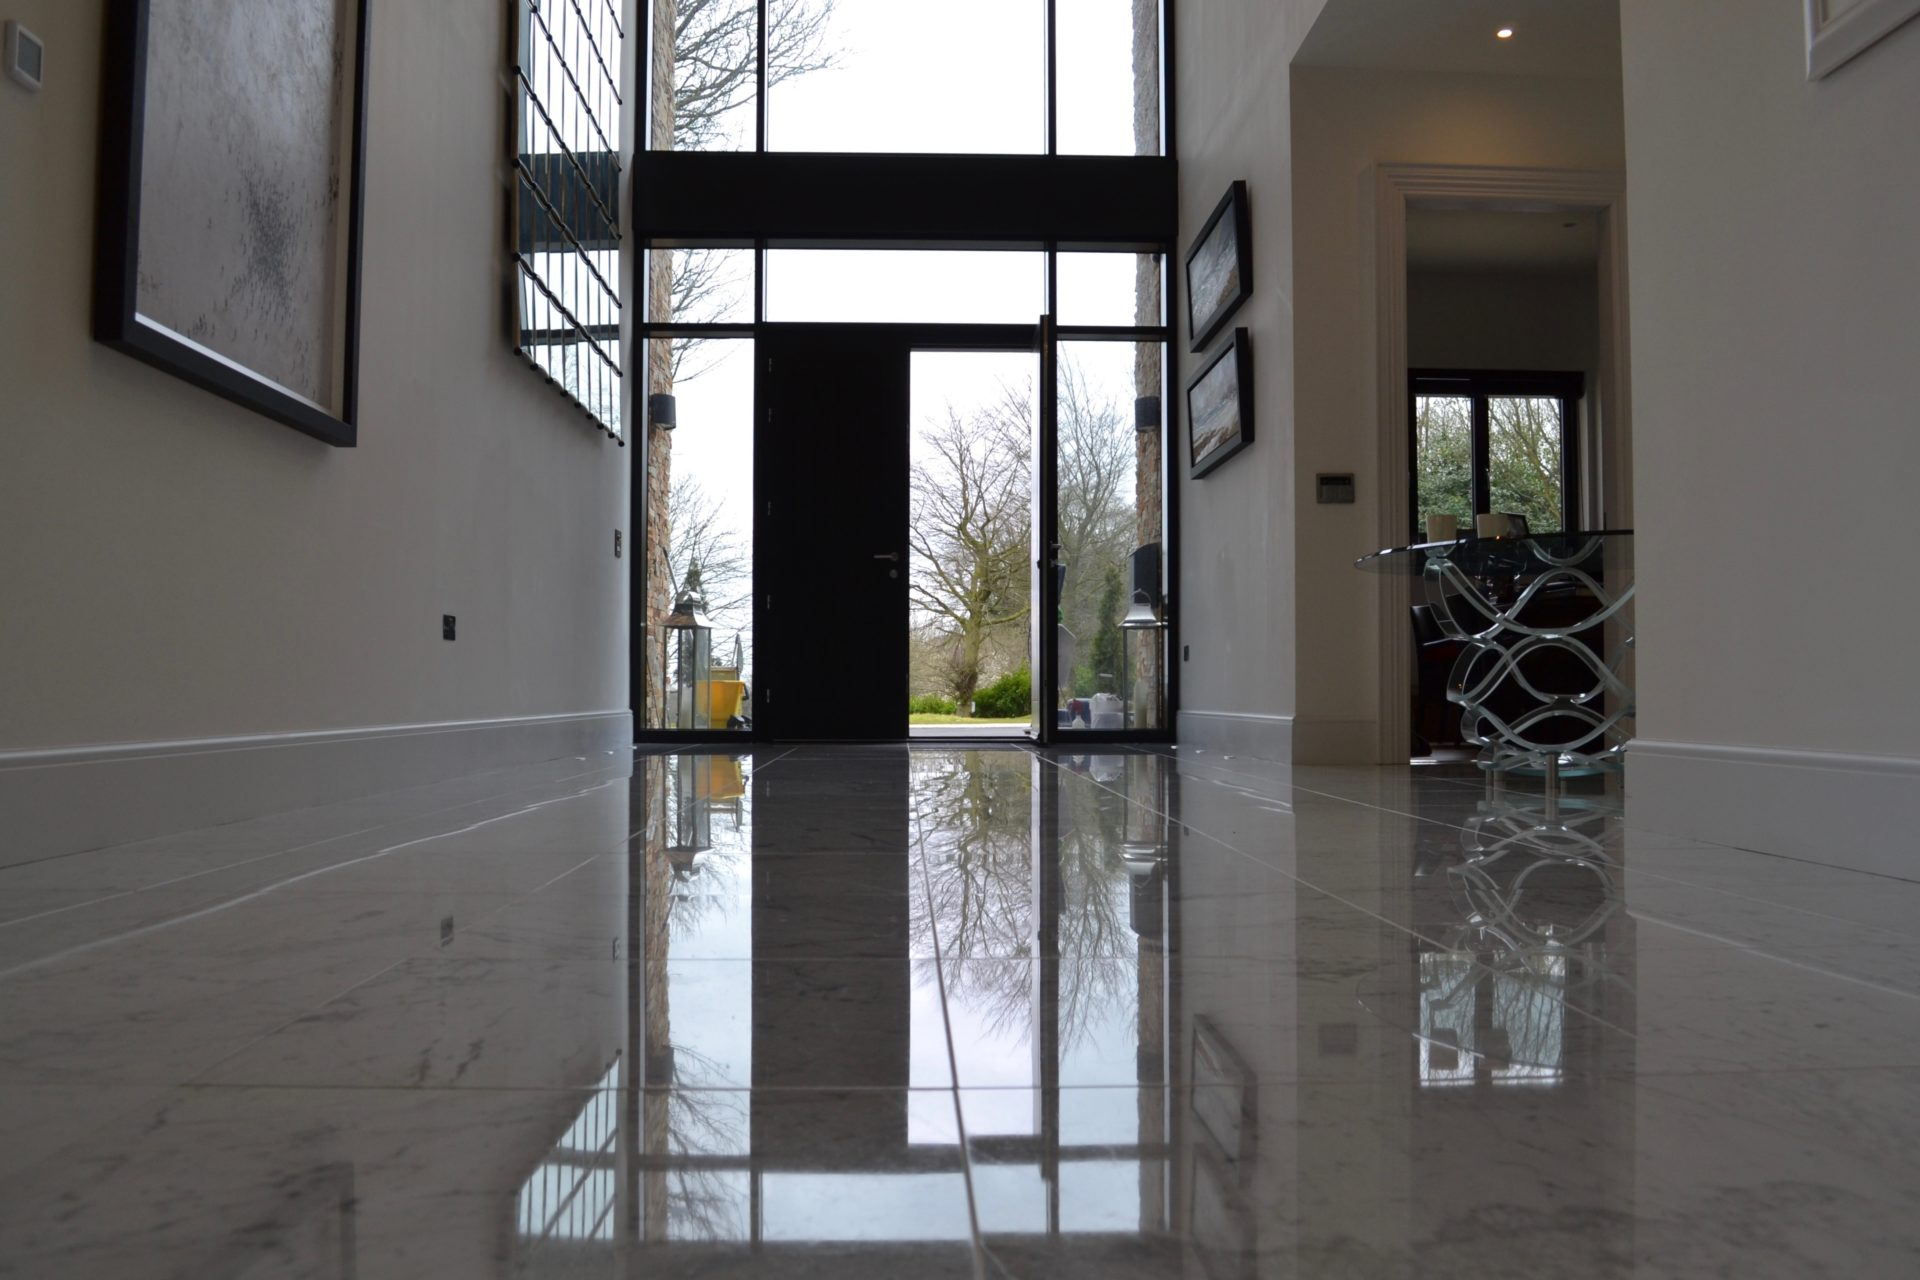 Marble floor cleaner cleaning restoration sealing company Oxshott Cobham Esher Weybridge Surrey